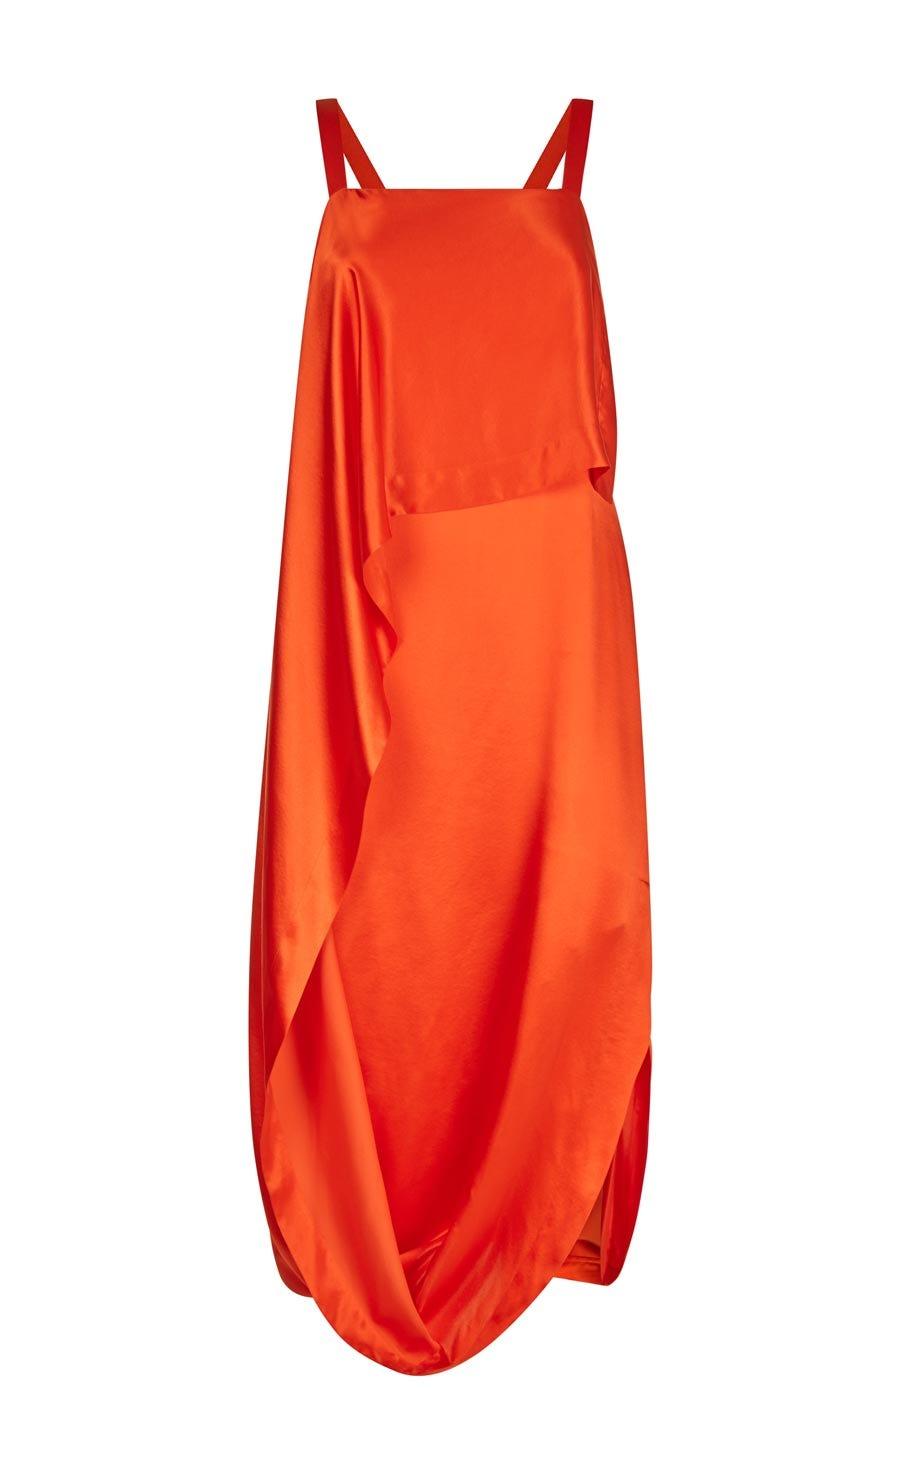 Darling Draped Dress